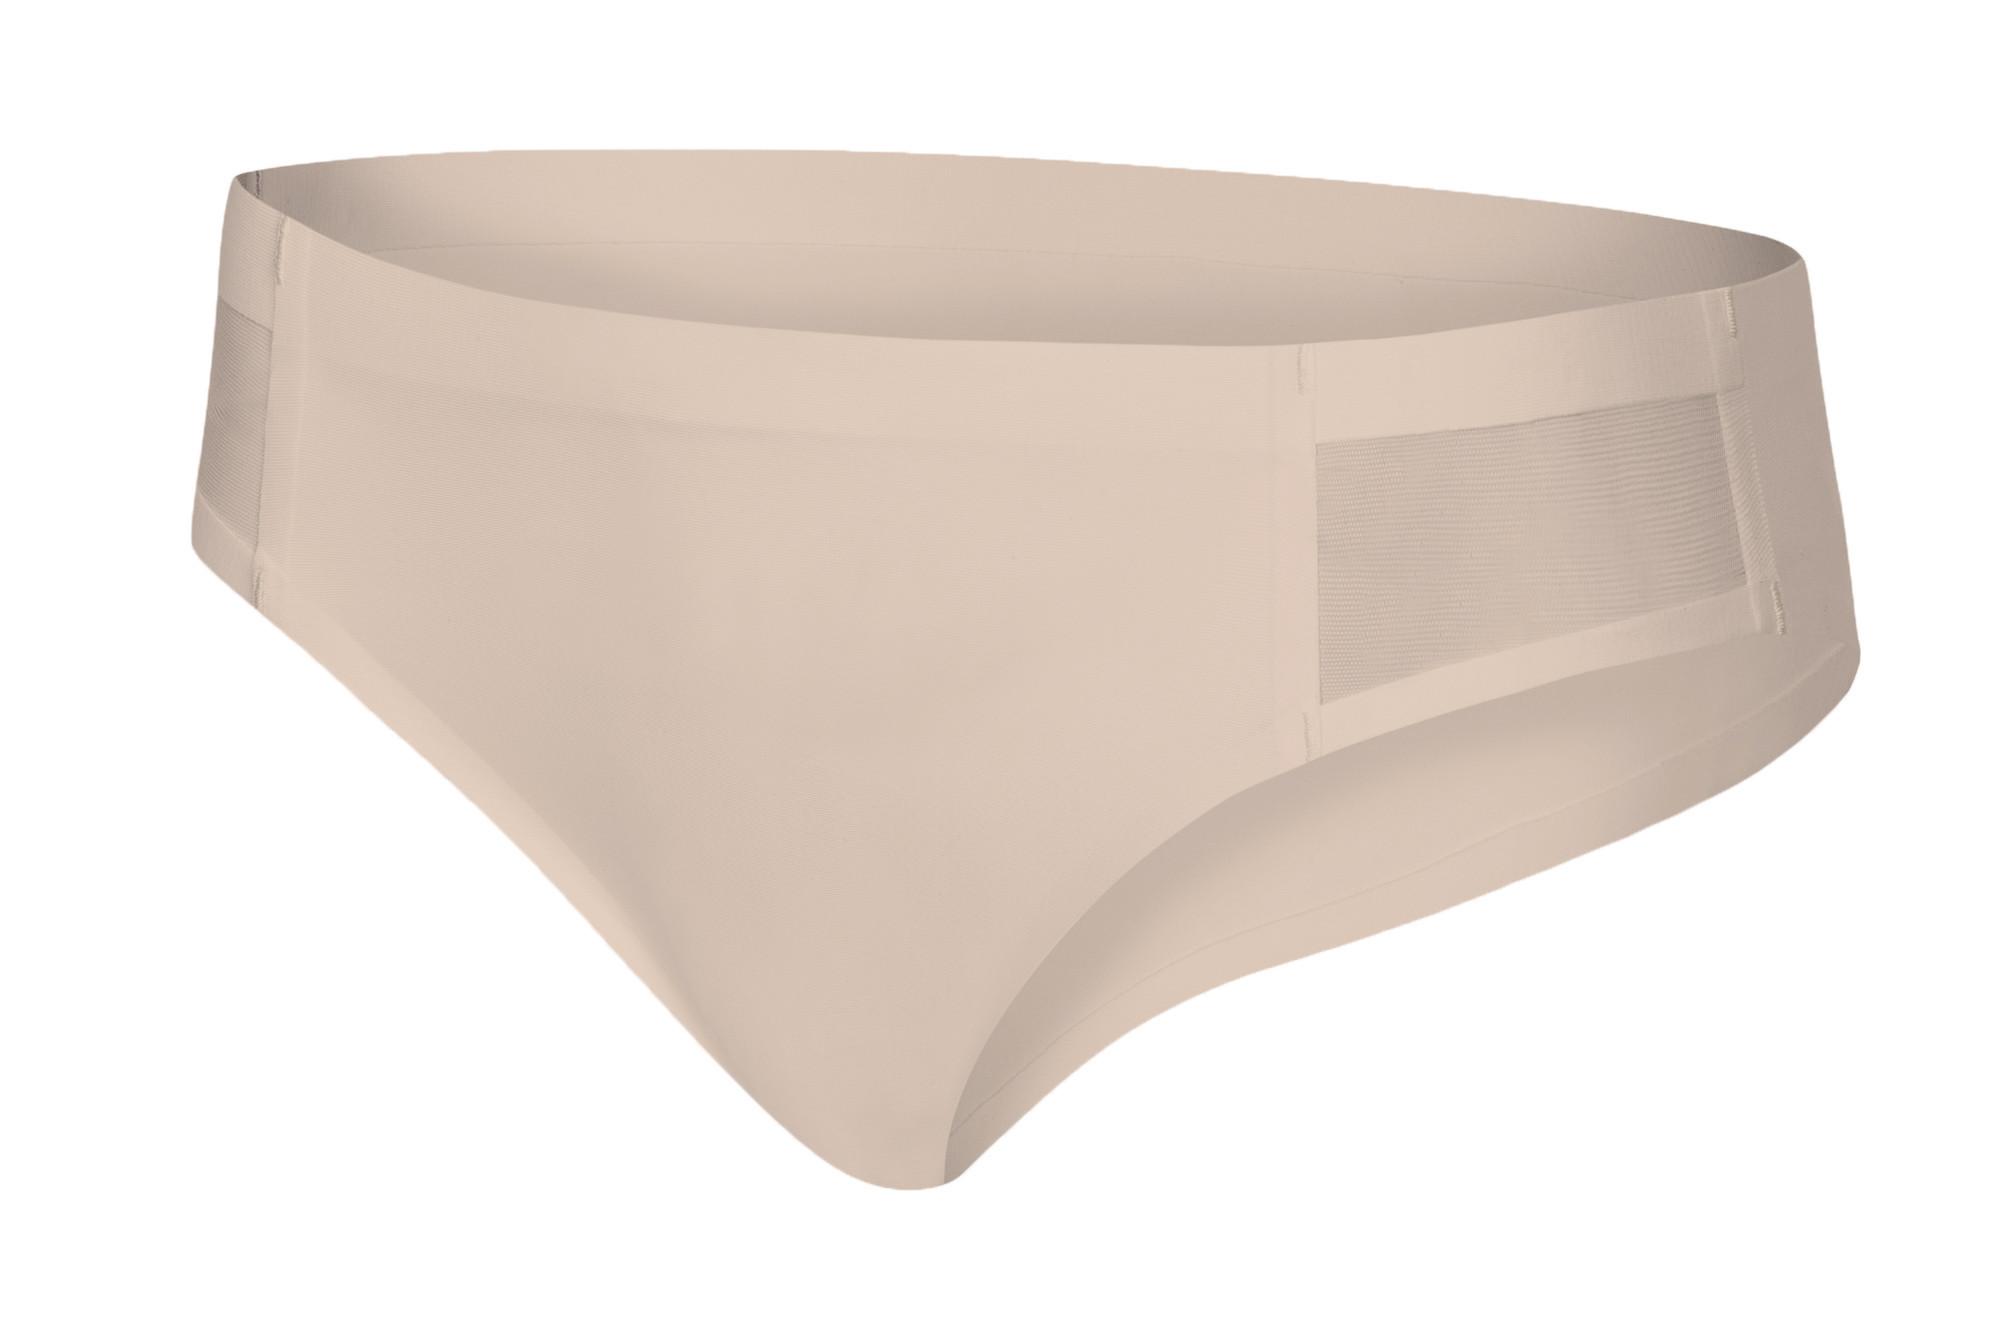 Kalhotky Bikini béžová - Julimex béžová XL